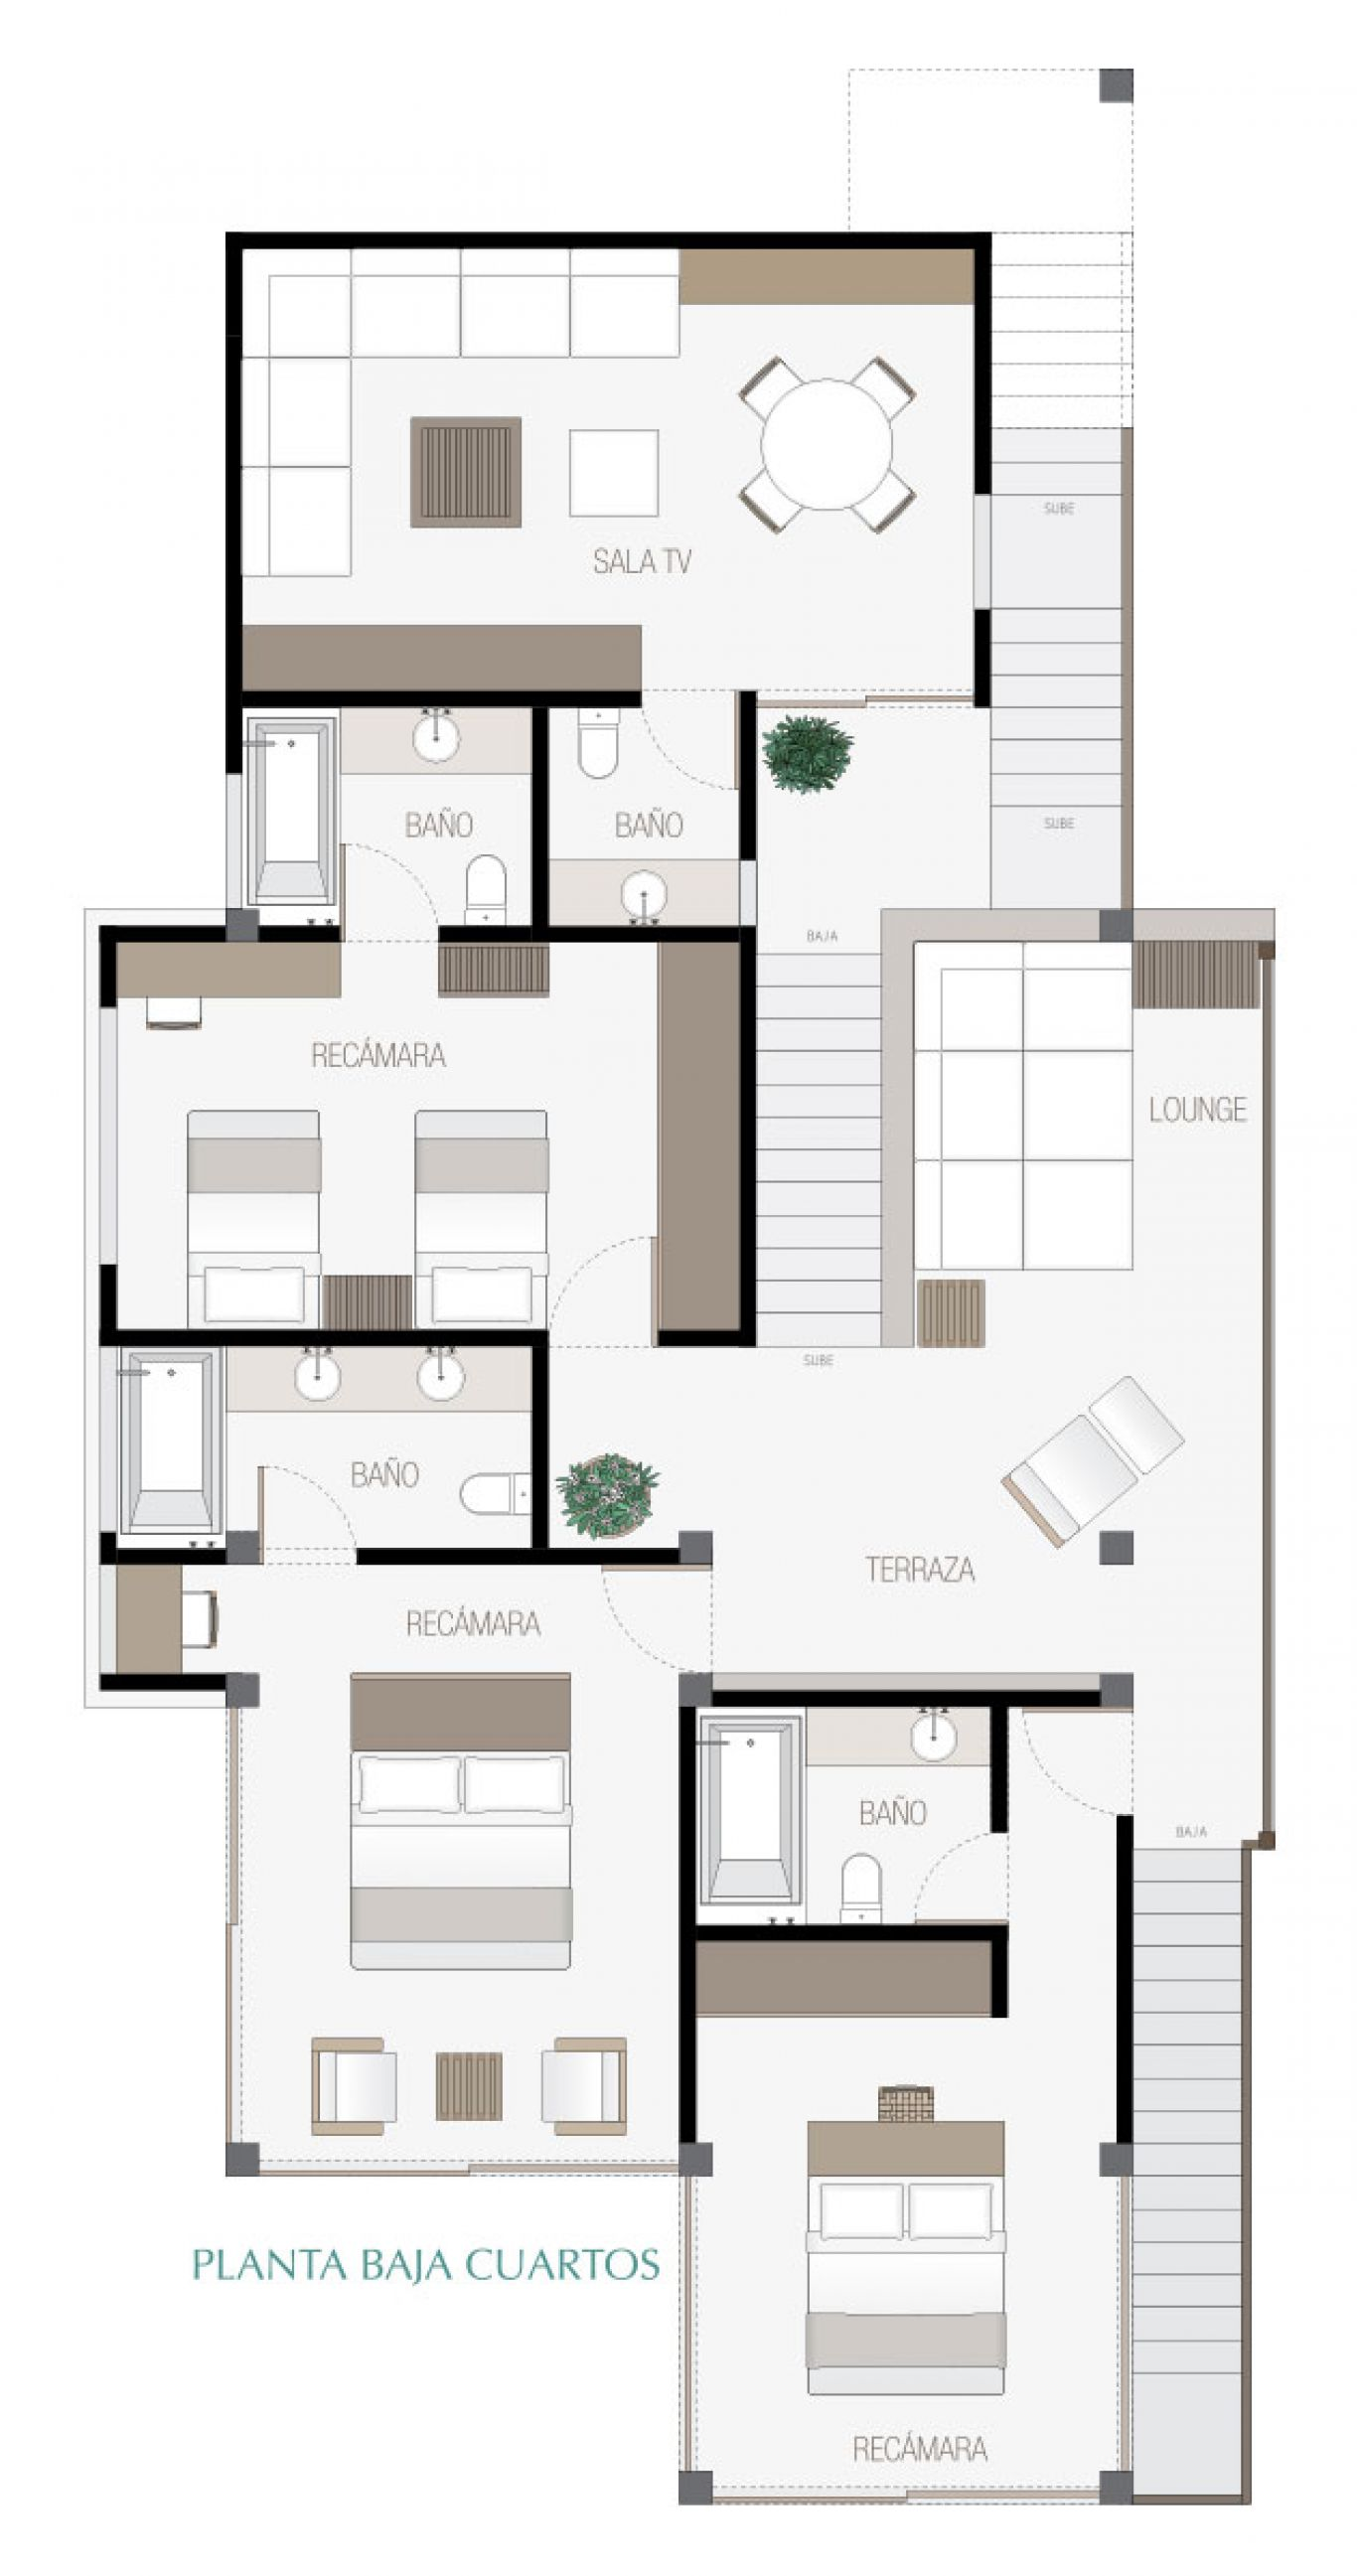 Manai, id 1519068, no 4, plano de villa 11, 298